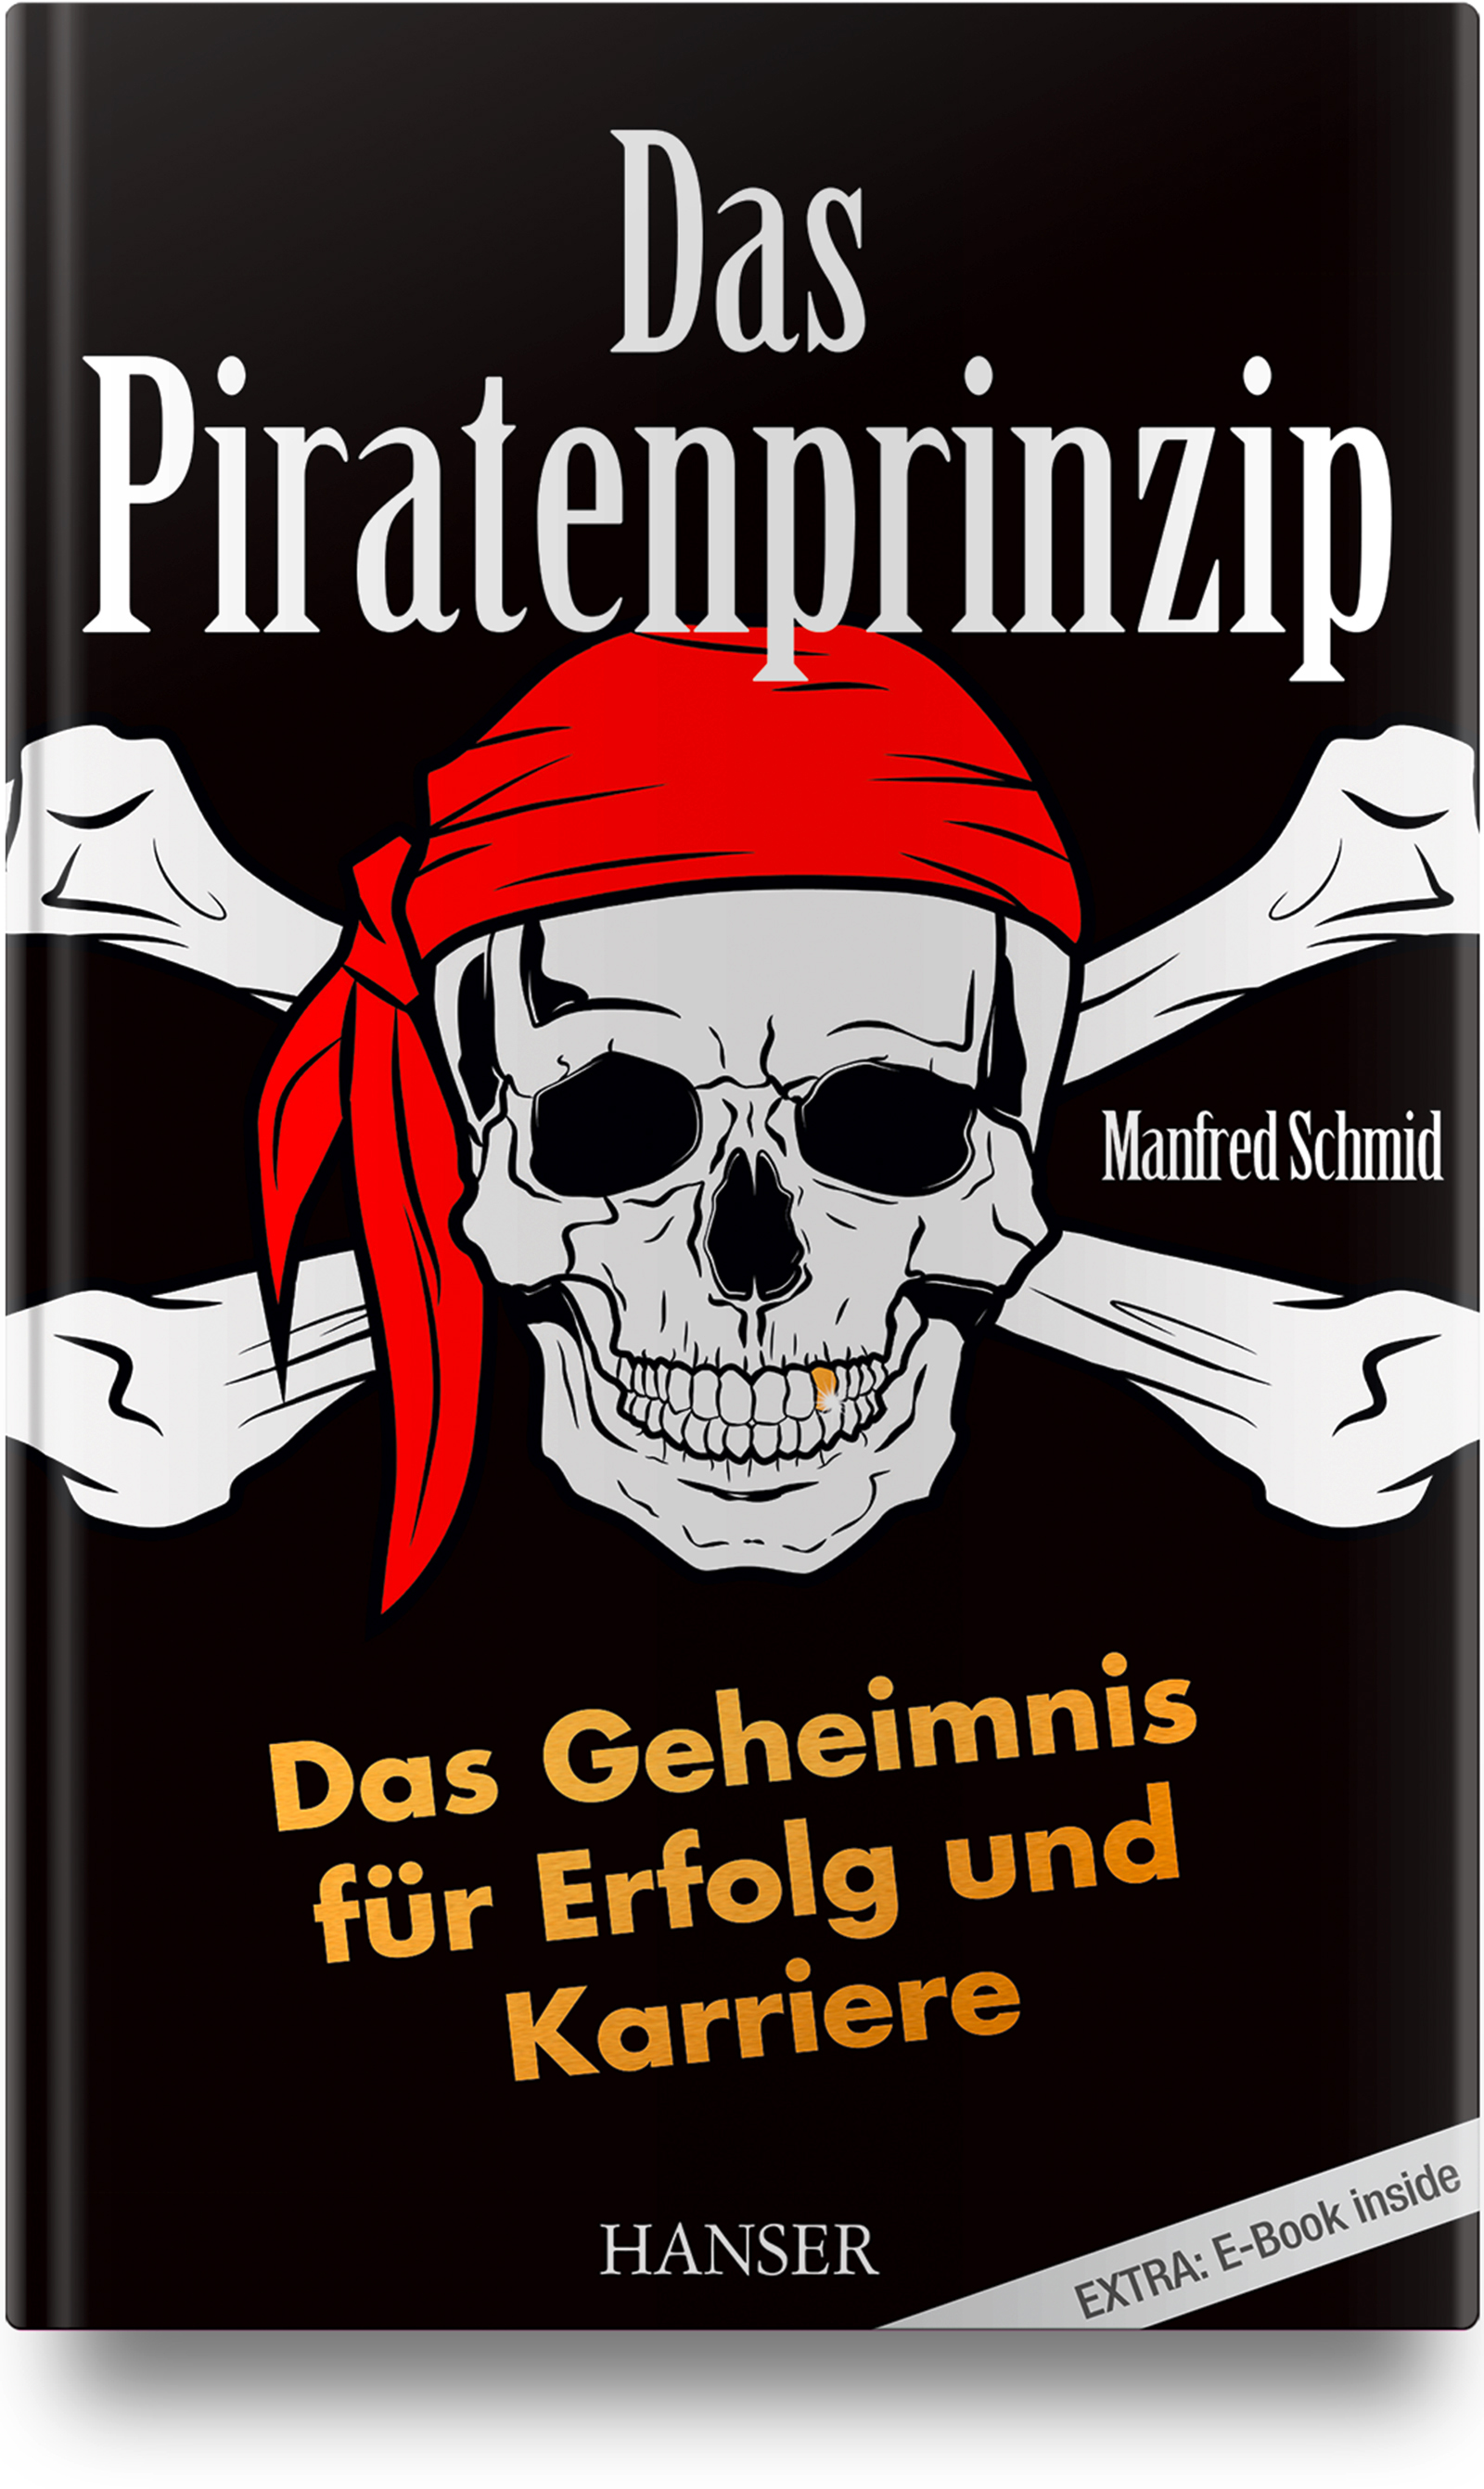 Schmid, Das Piratenprinzip, 978-3-446-45524-5